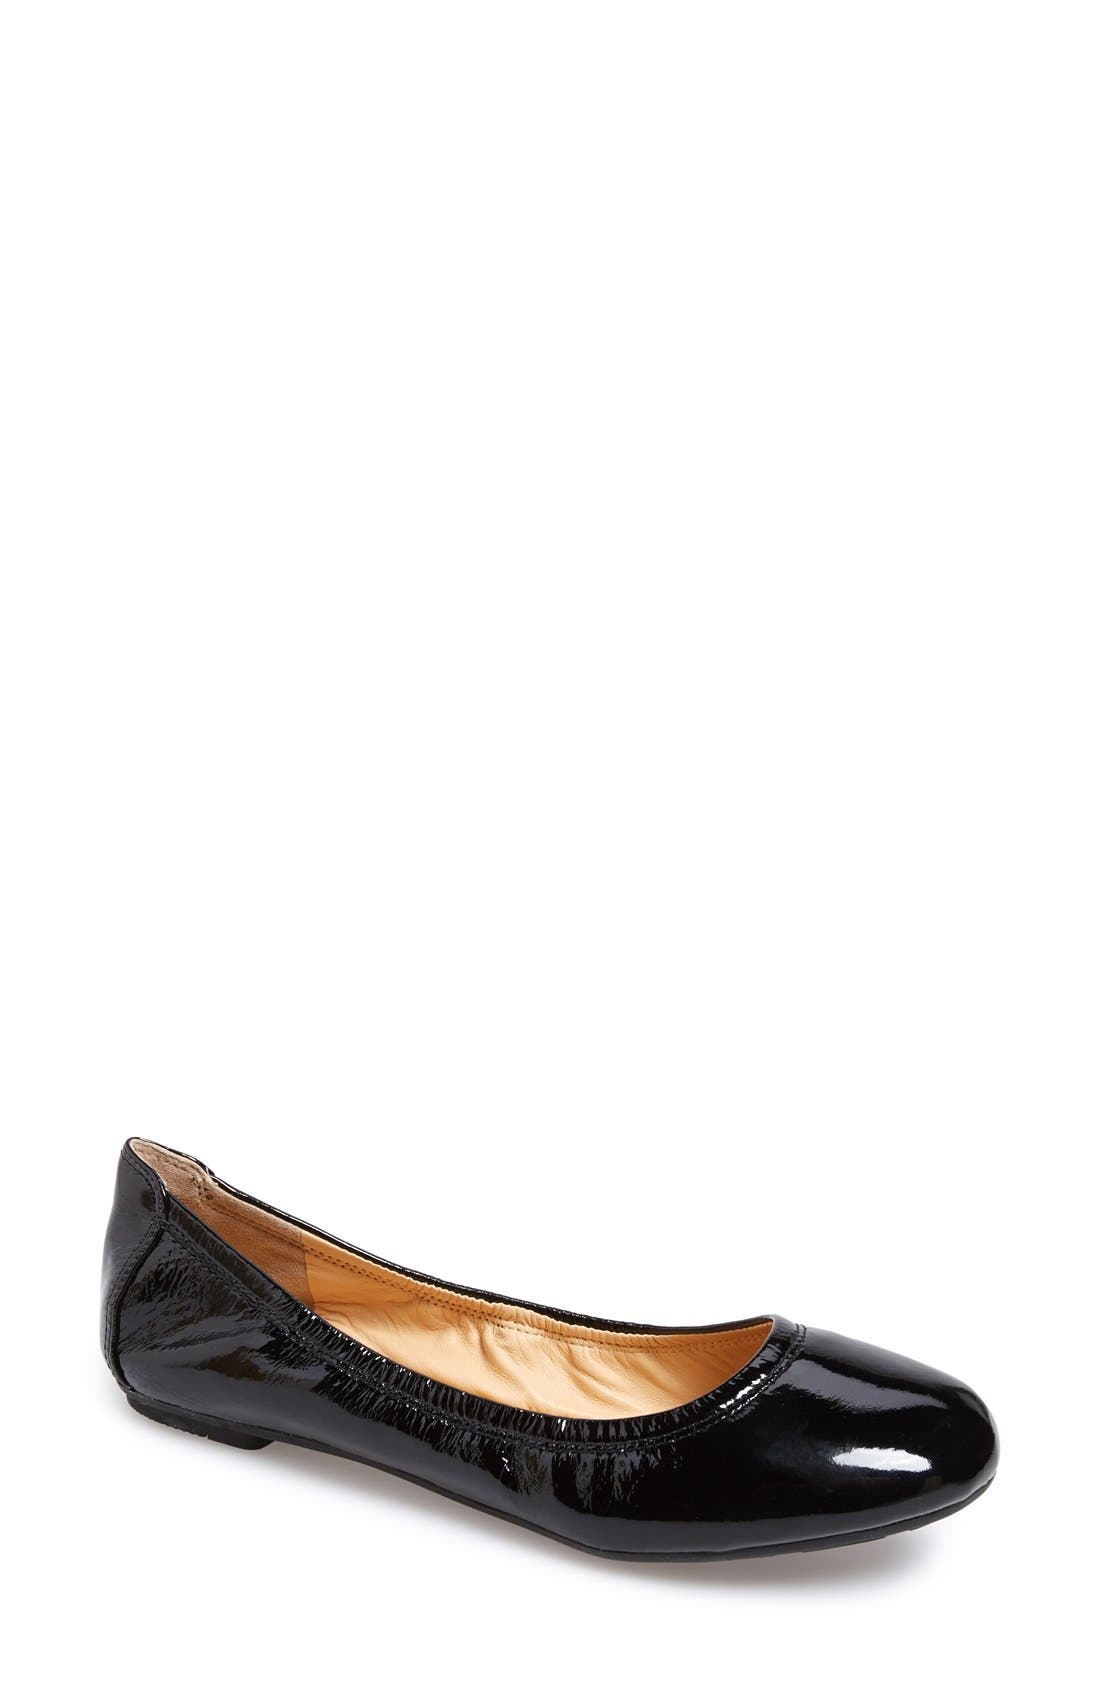 Alternate Image 1 Selected - Cole Haan 'Manhattan' Leather Ballet Flat (Women)